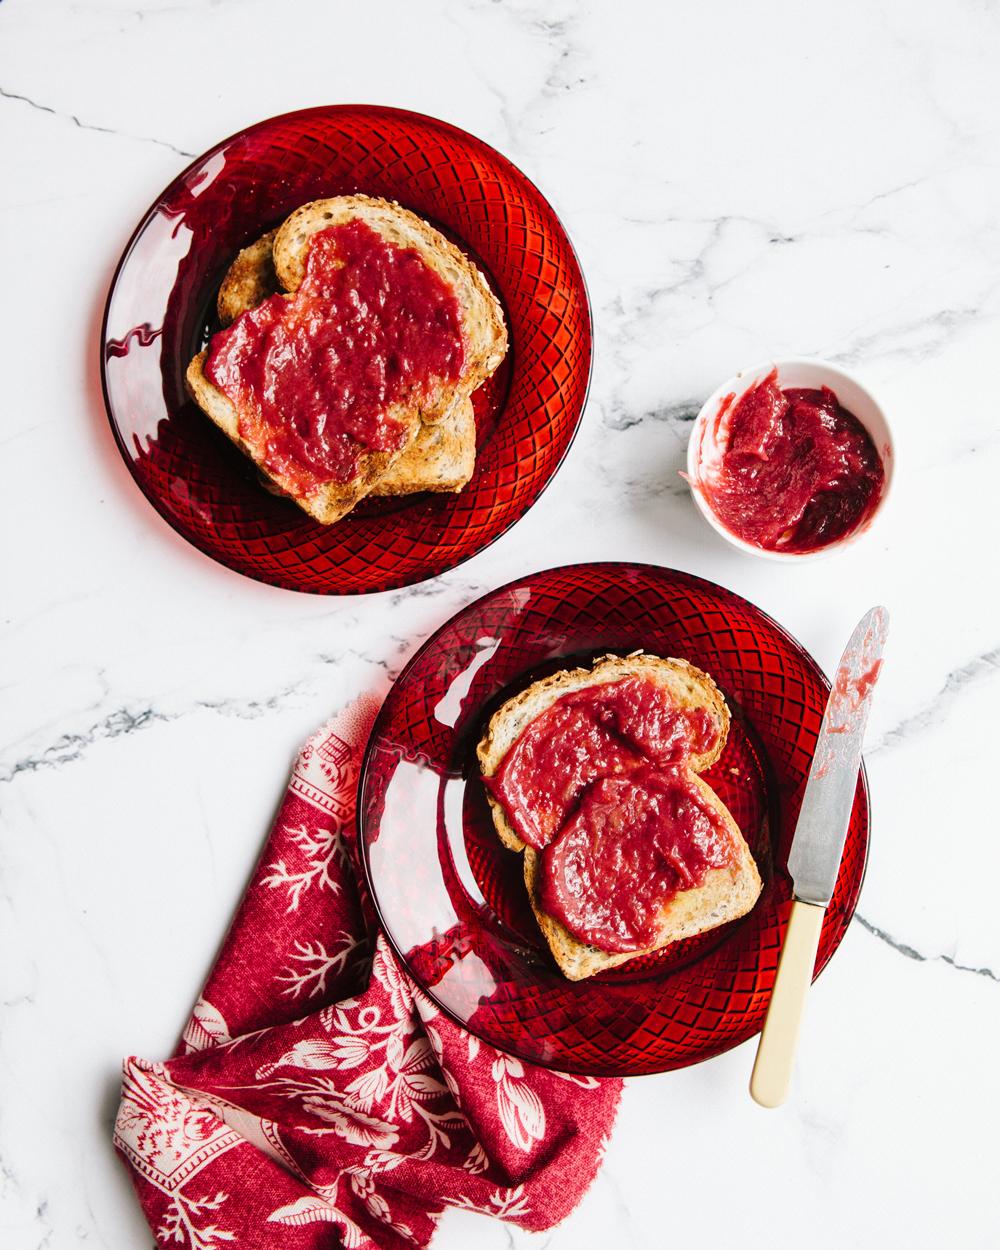 Small-batch Maple Rhubarb Jam With Cardamom-4.jpg